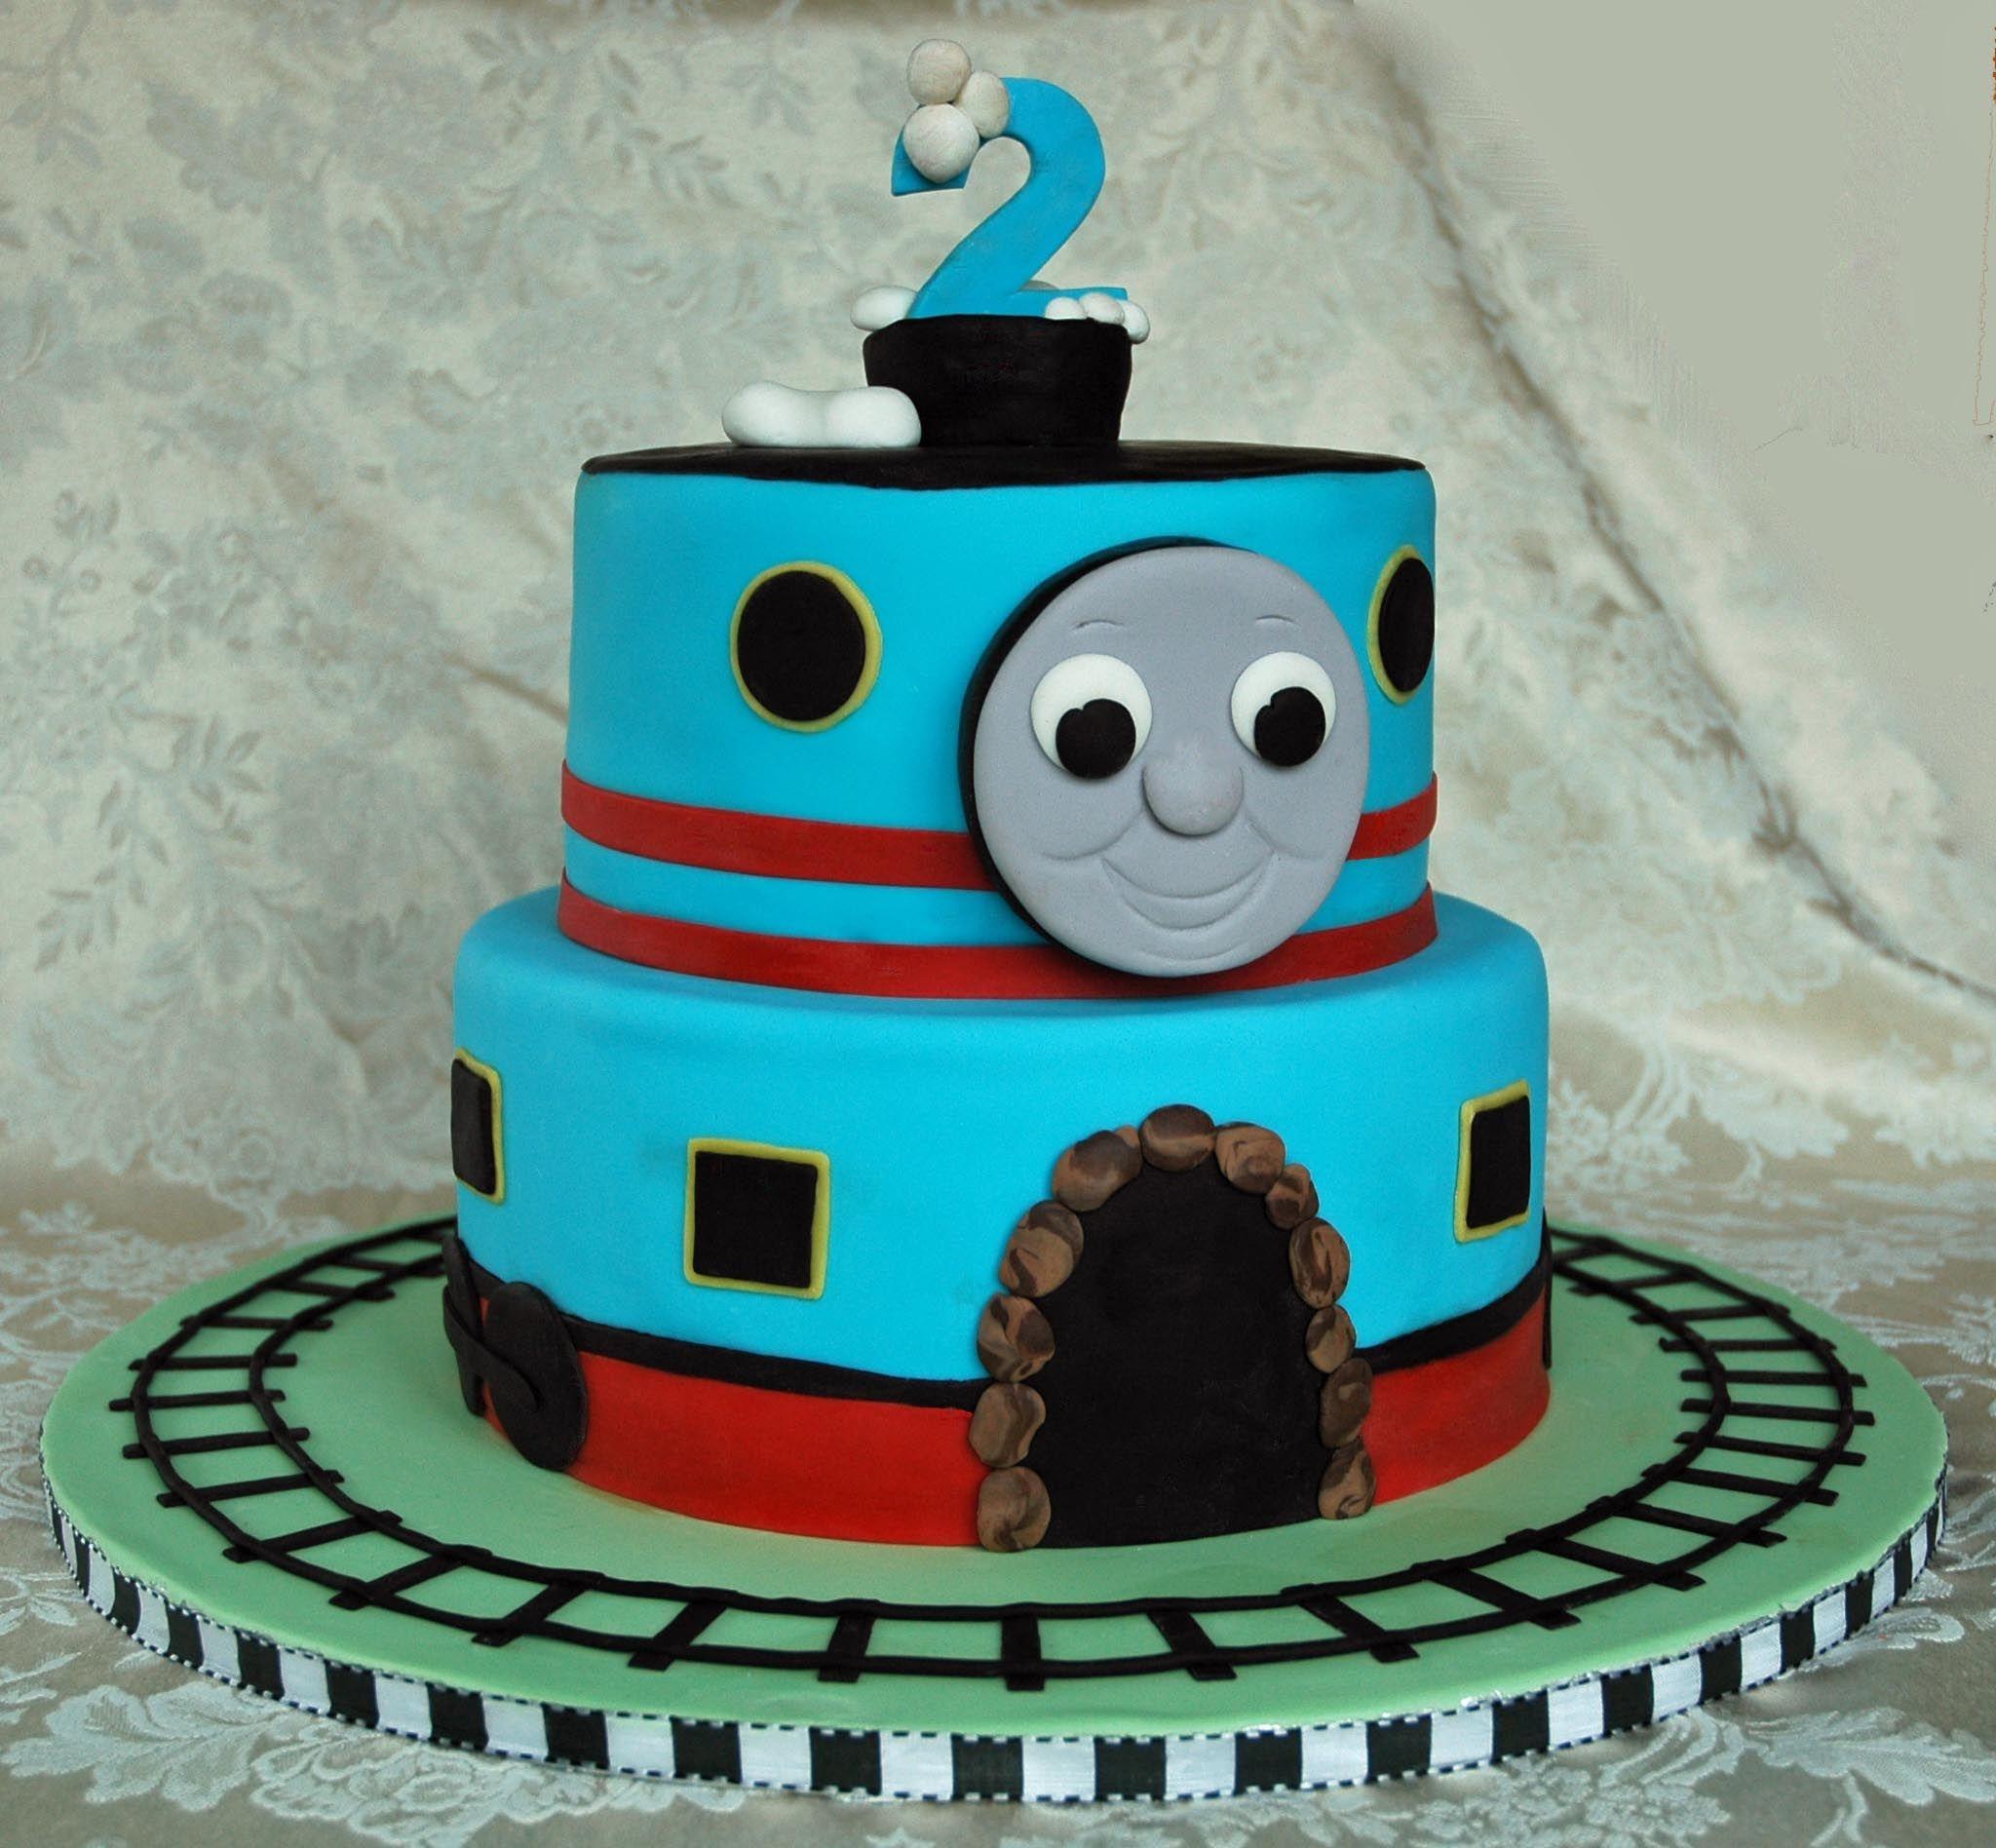 Thomas The Train Birthday Cake 1gateau